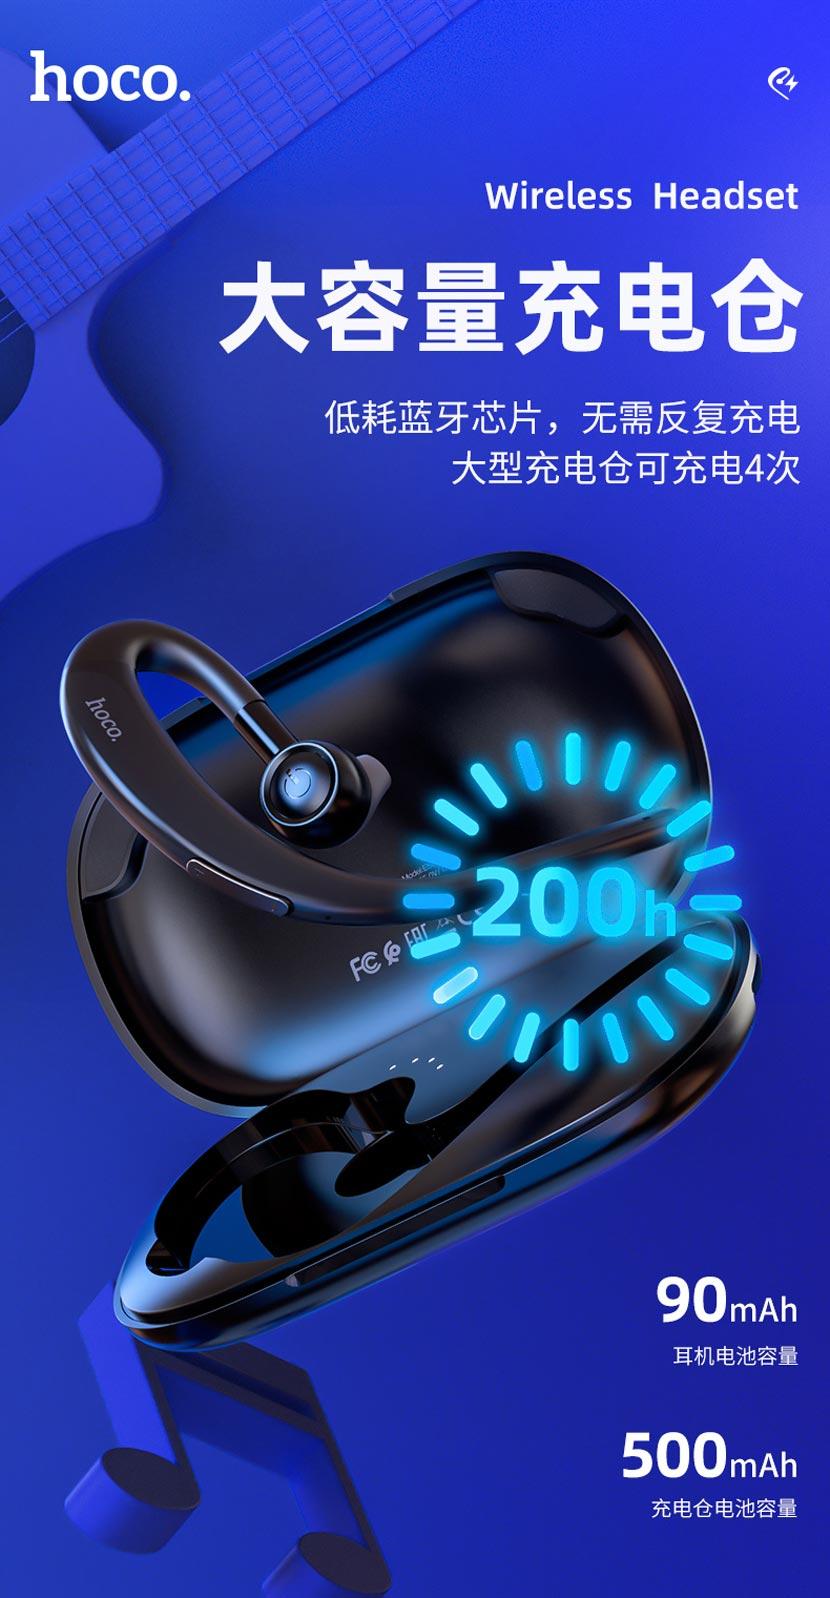 hoco news e56 shine business wireless headset case cn